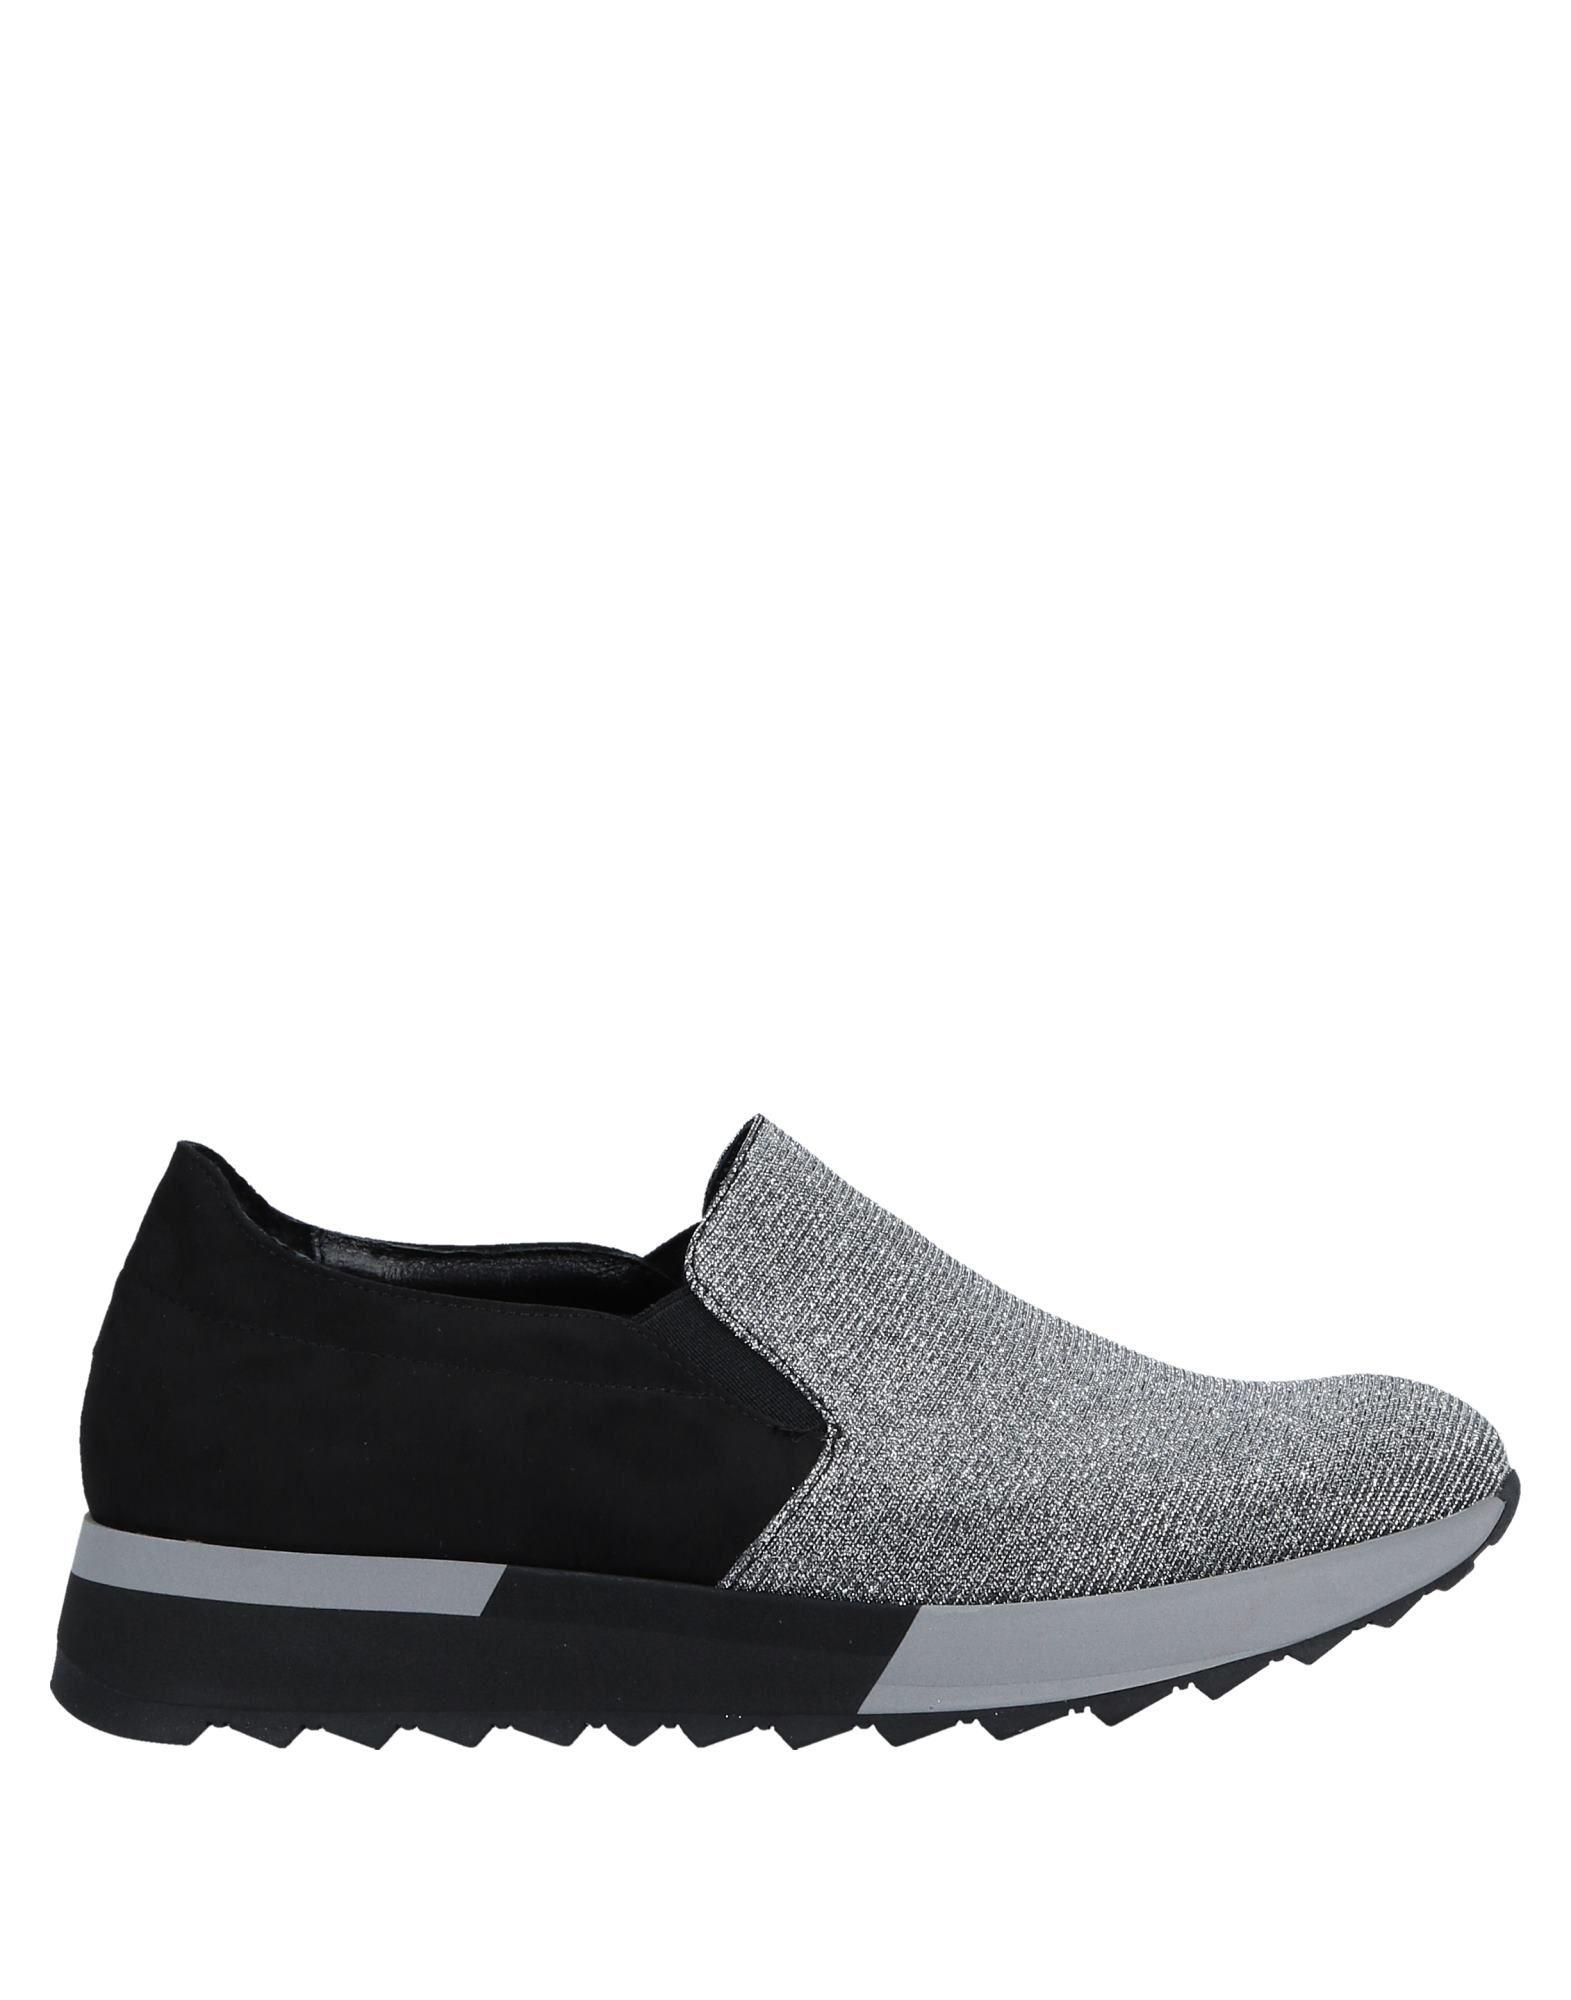 Sneakers Angela George Donna Donna George - 11534051BG 7271e8